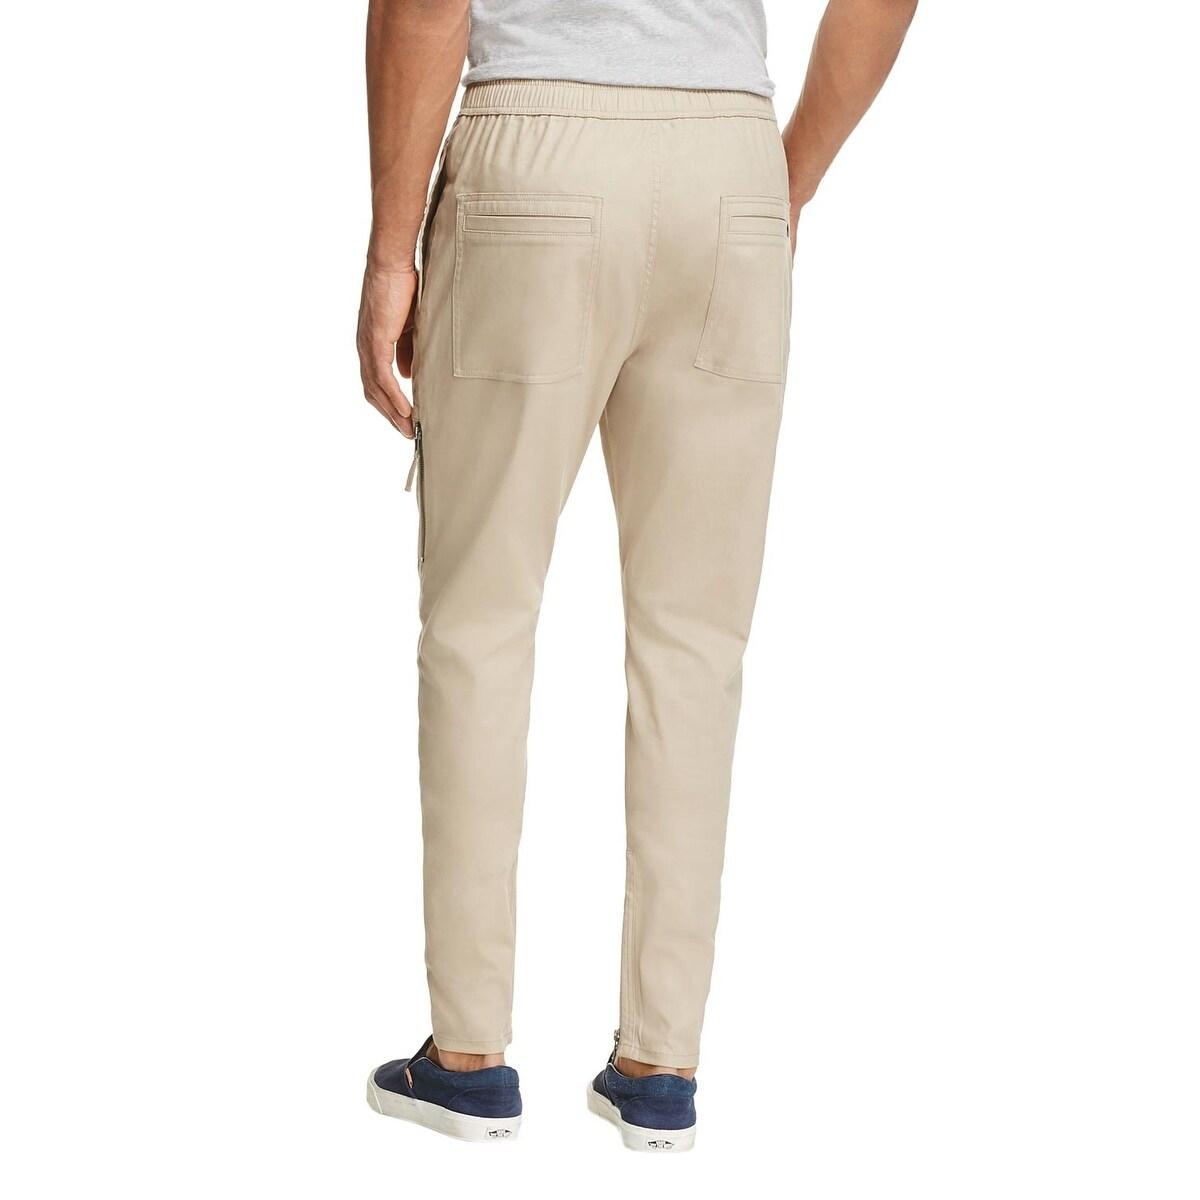 latest selection shoes for cheap largest selection of 2019 Zanerobe Blockshot Drawstring Regular Fit Chino Pants 30x30 Khaki Cargo  Pants